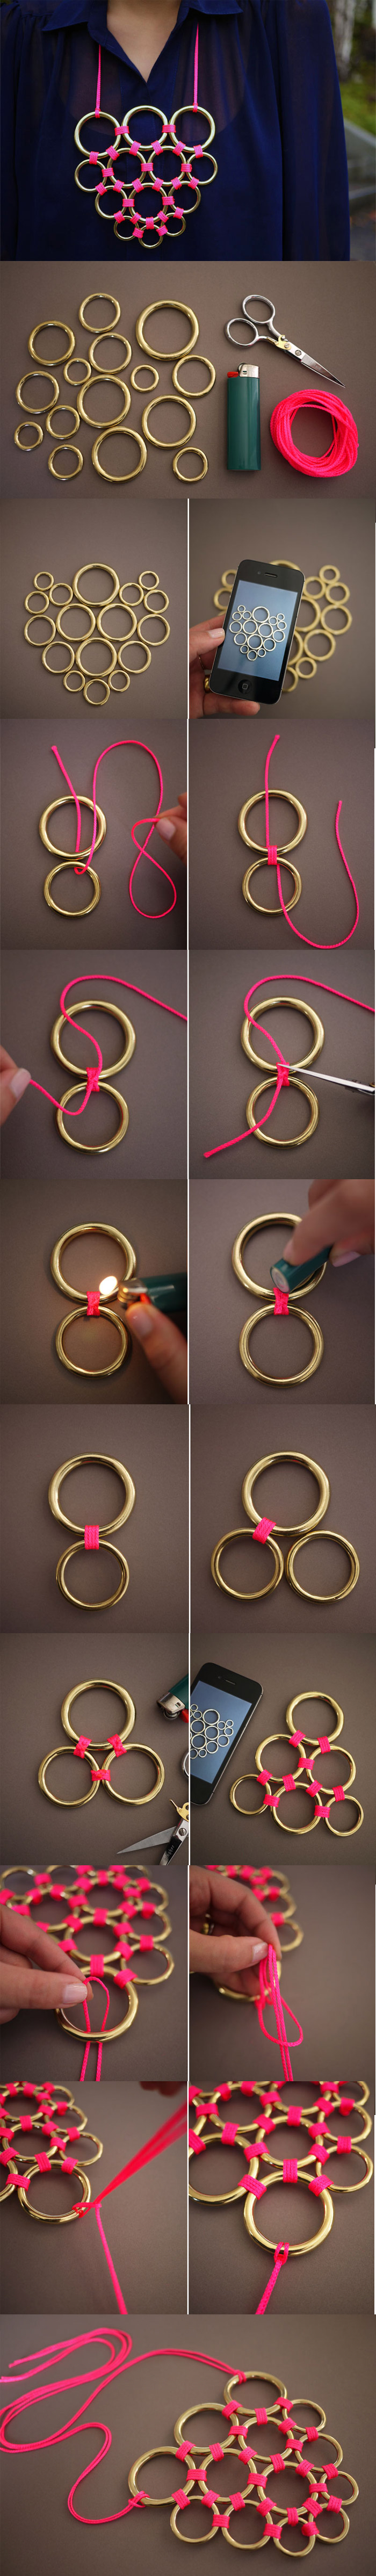 DIY-Gretchen-Jones-Necklace